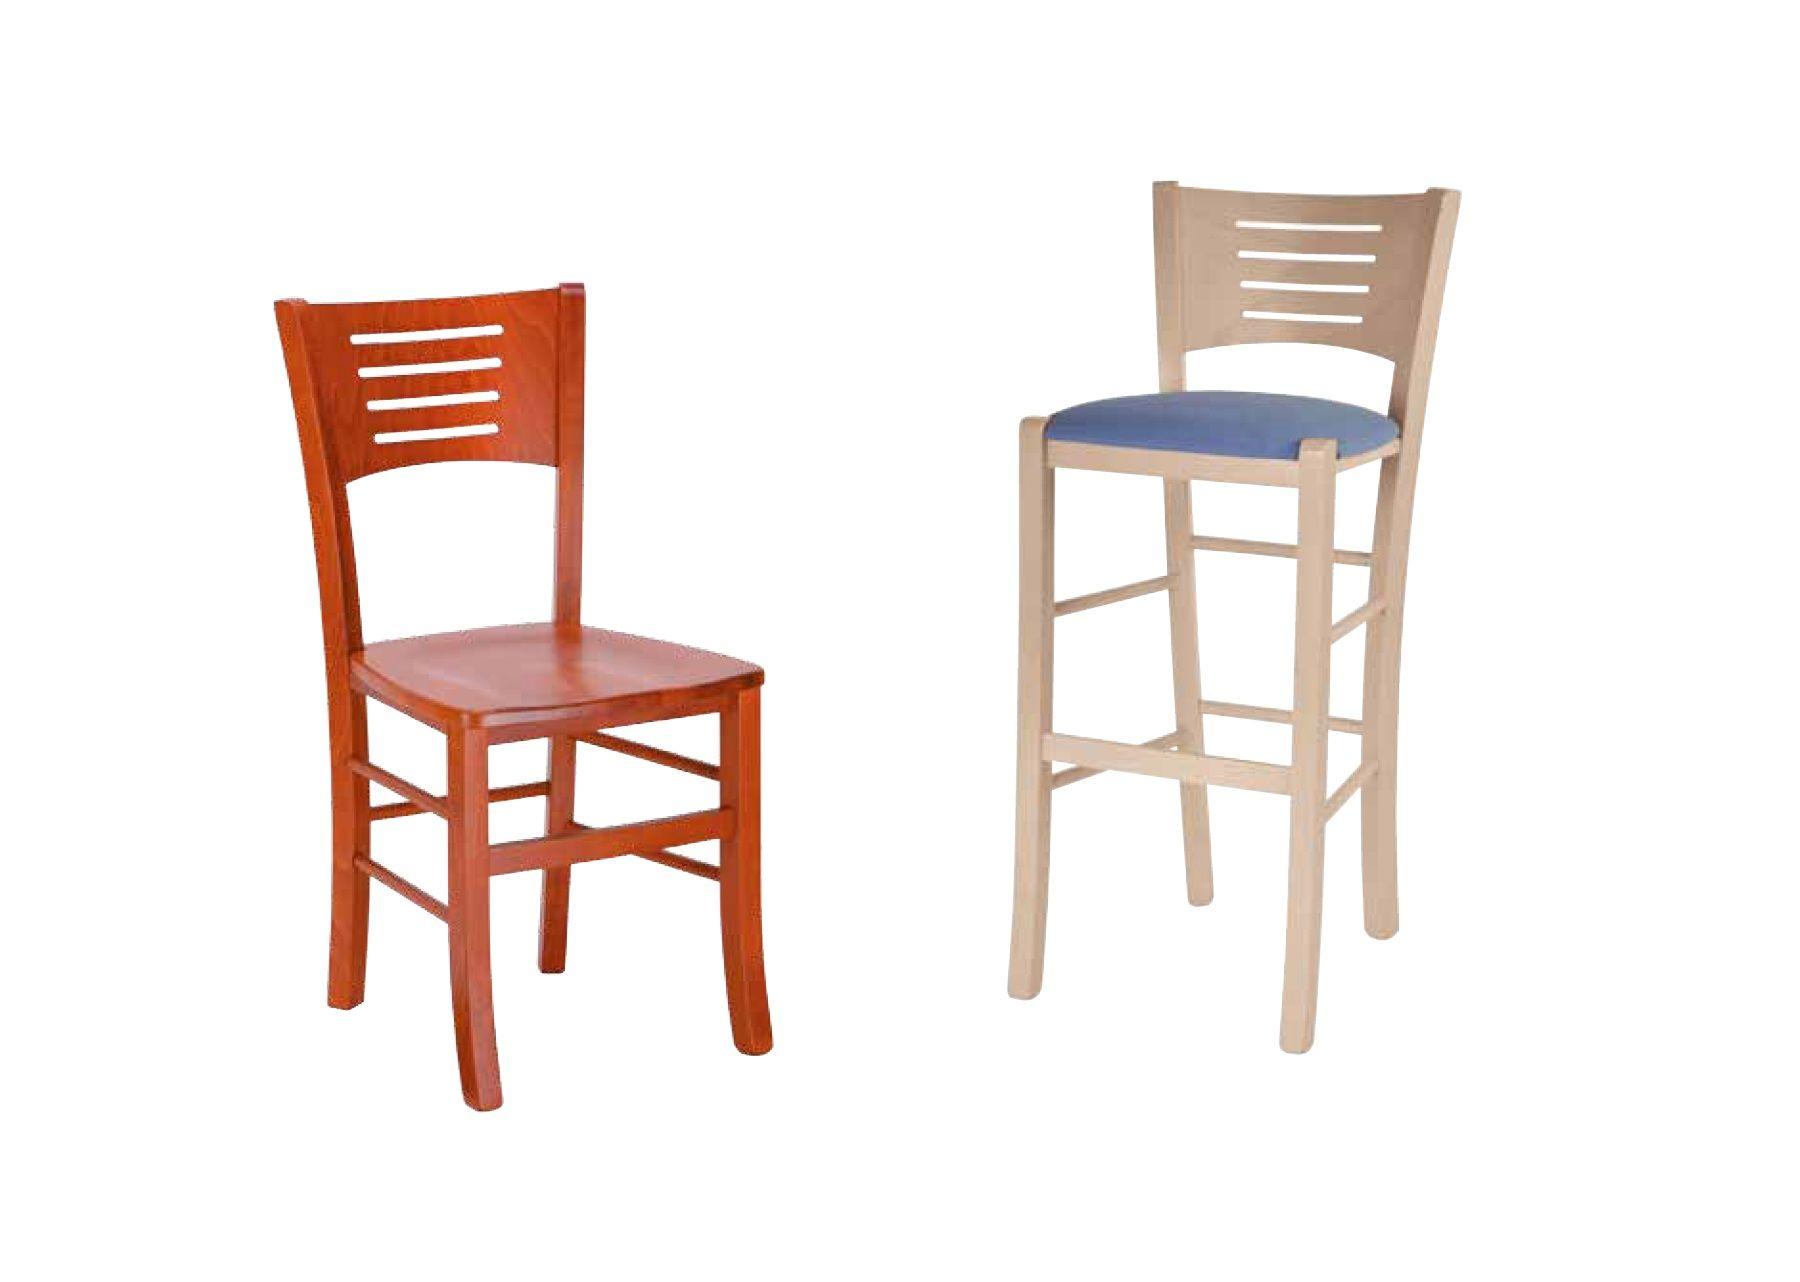 Friultone Sedie ~ Indoorseating xline sedie e tavoli